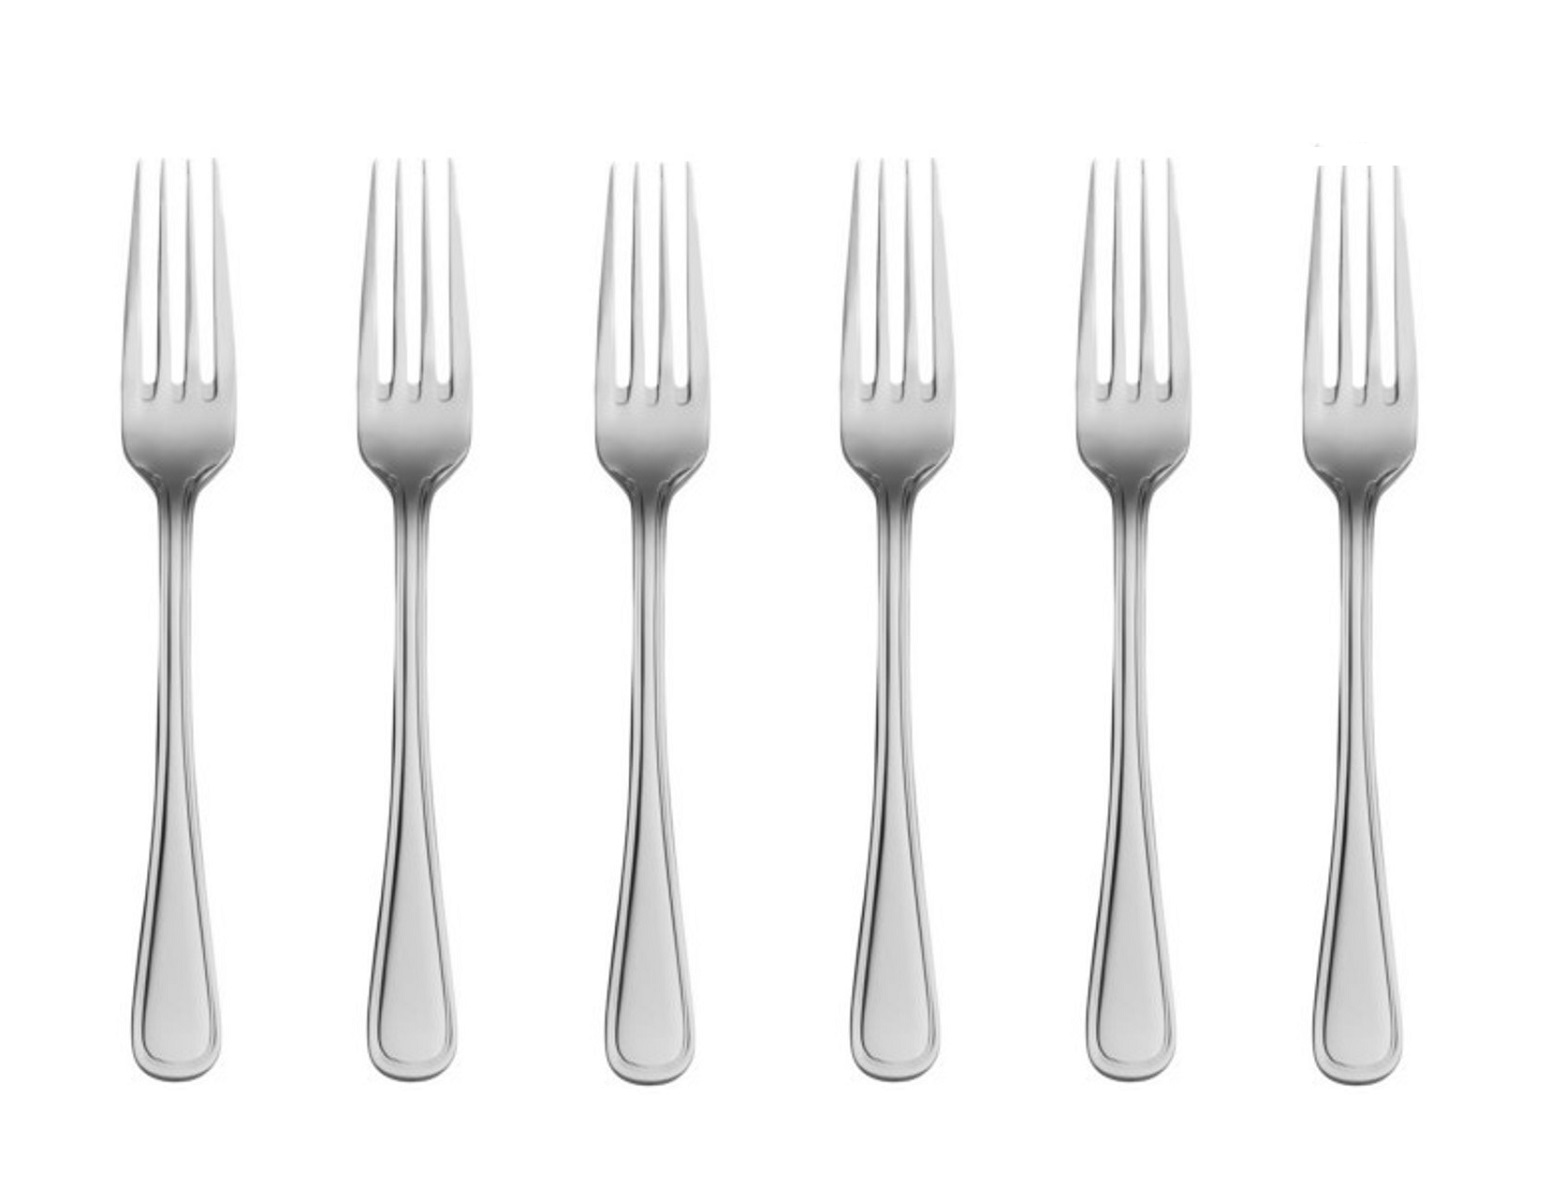 Онлайн каталог PROMENU: Набор вилок столовых Lusol AVALON, длина 20 см, серебристый, 6 штук Lusol 132021